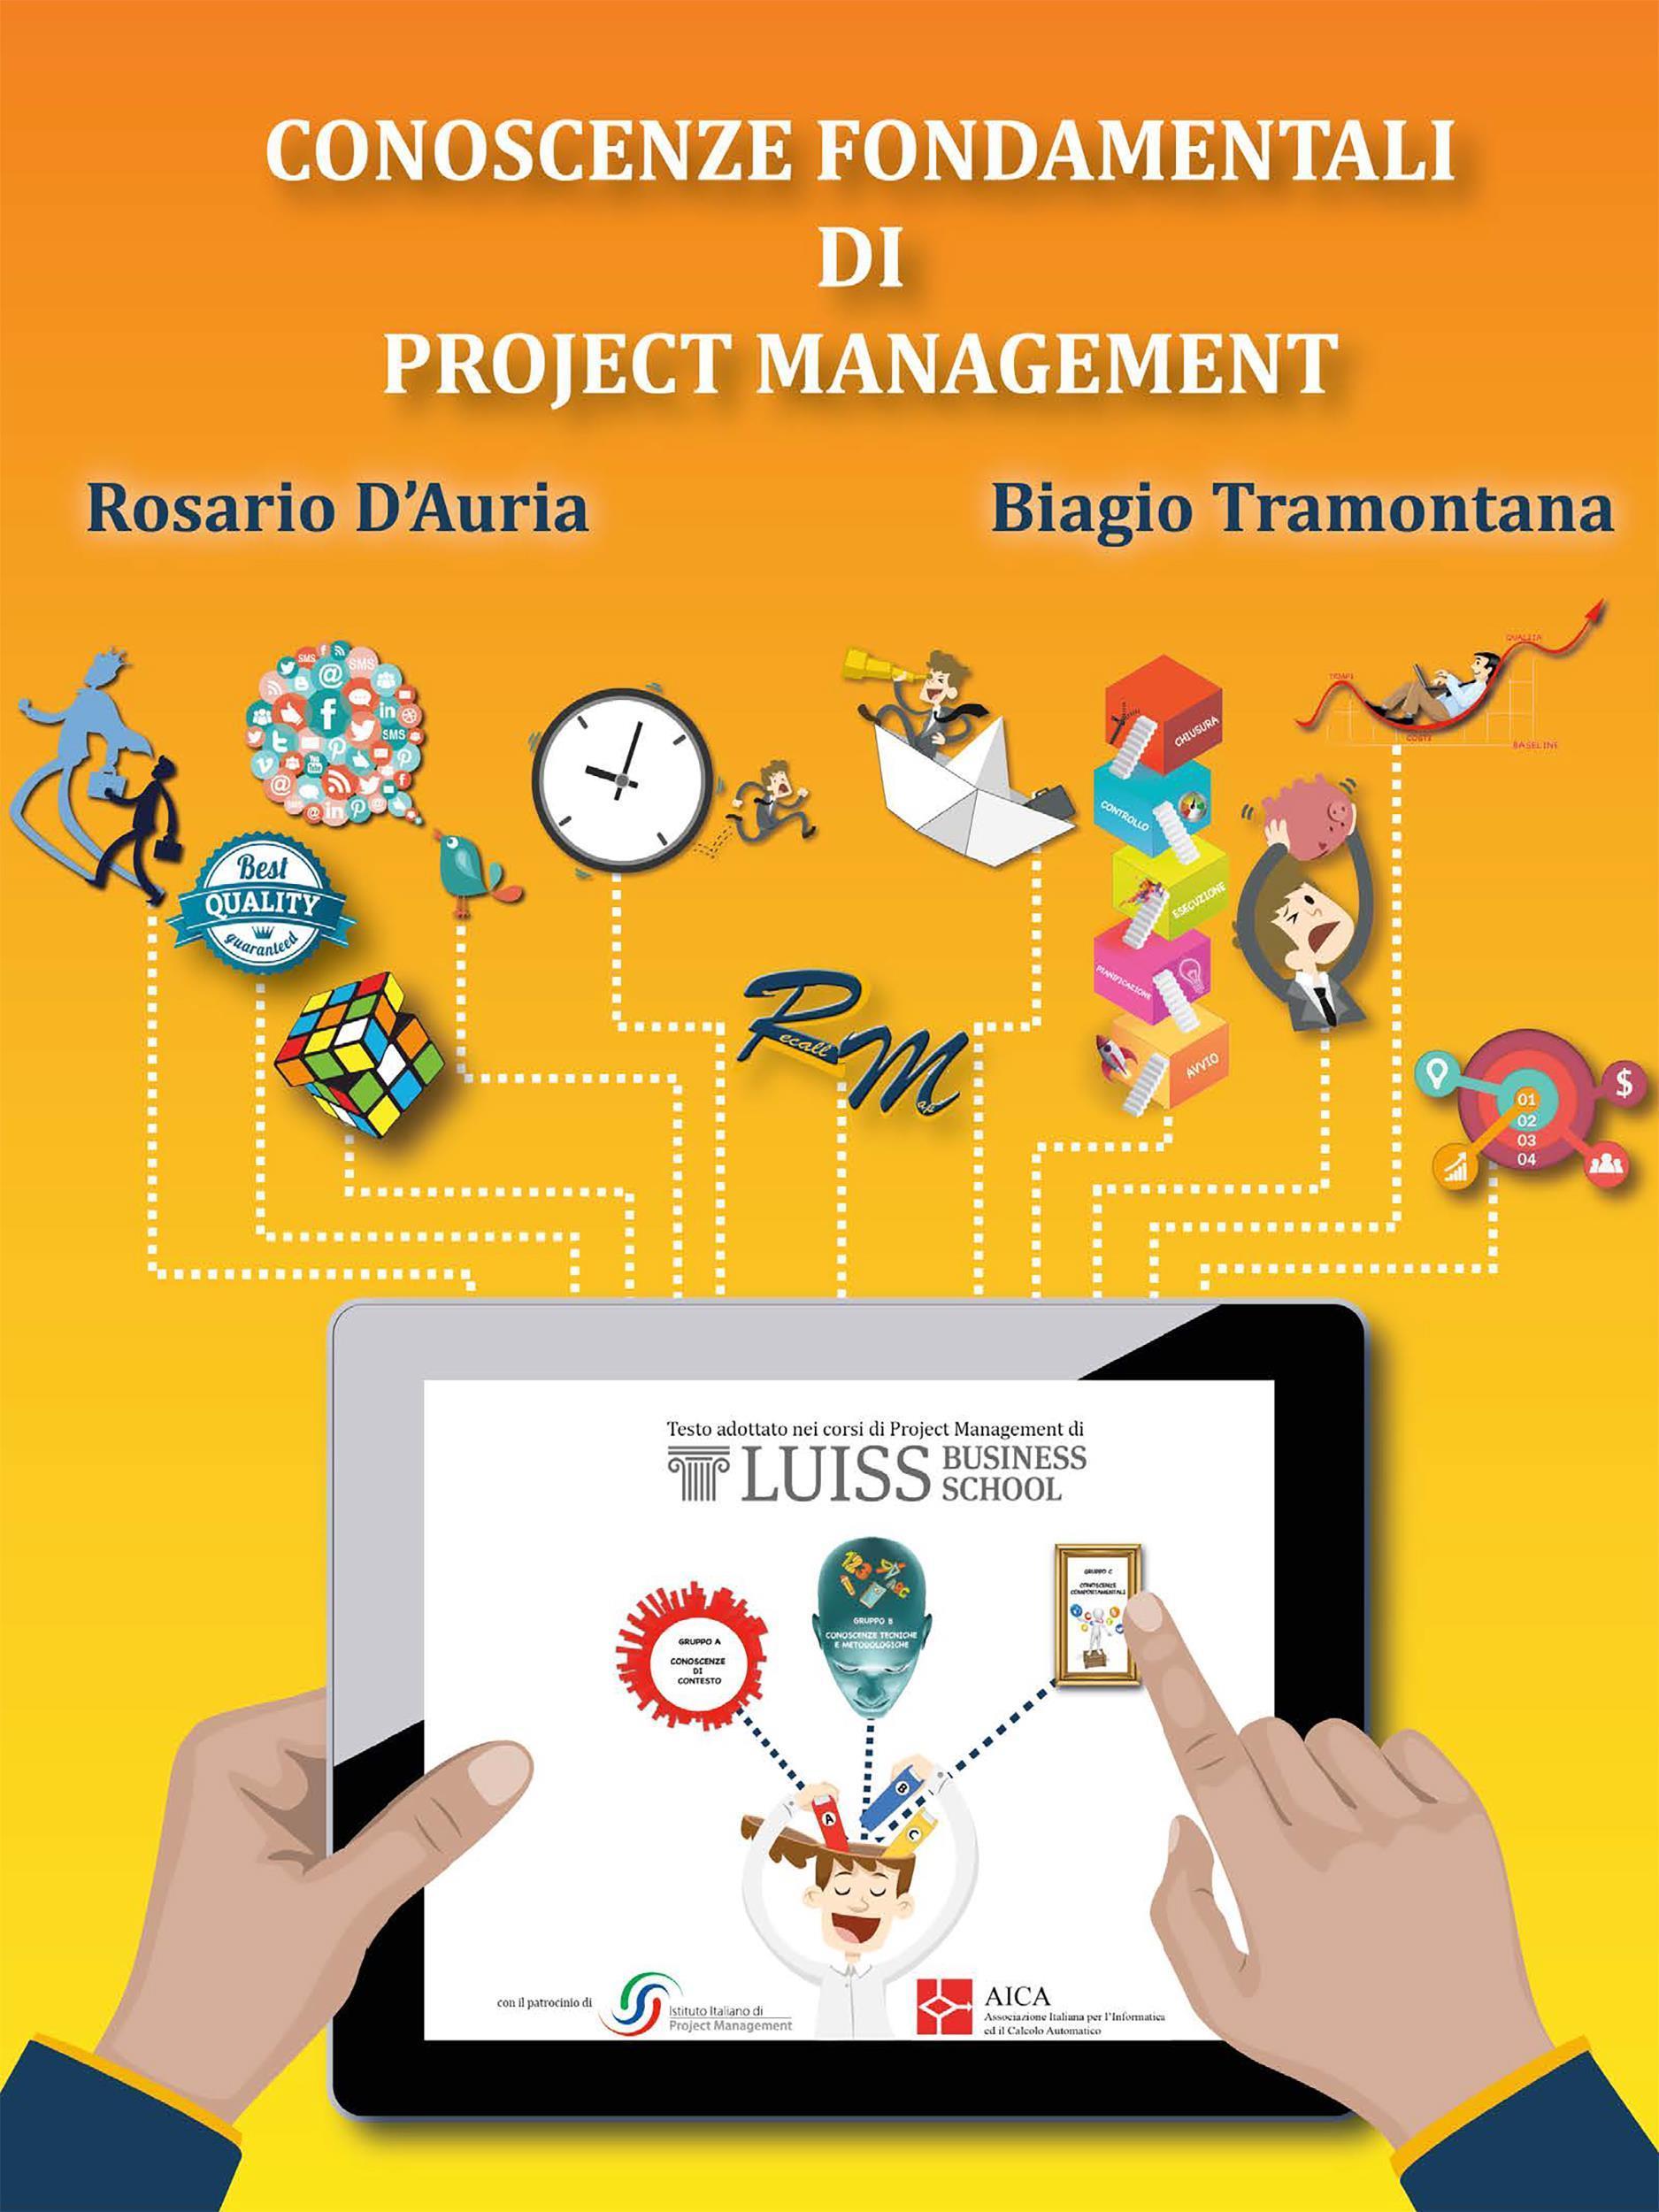 Conoscenze Fondamentali di Project Management